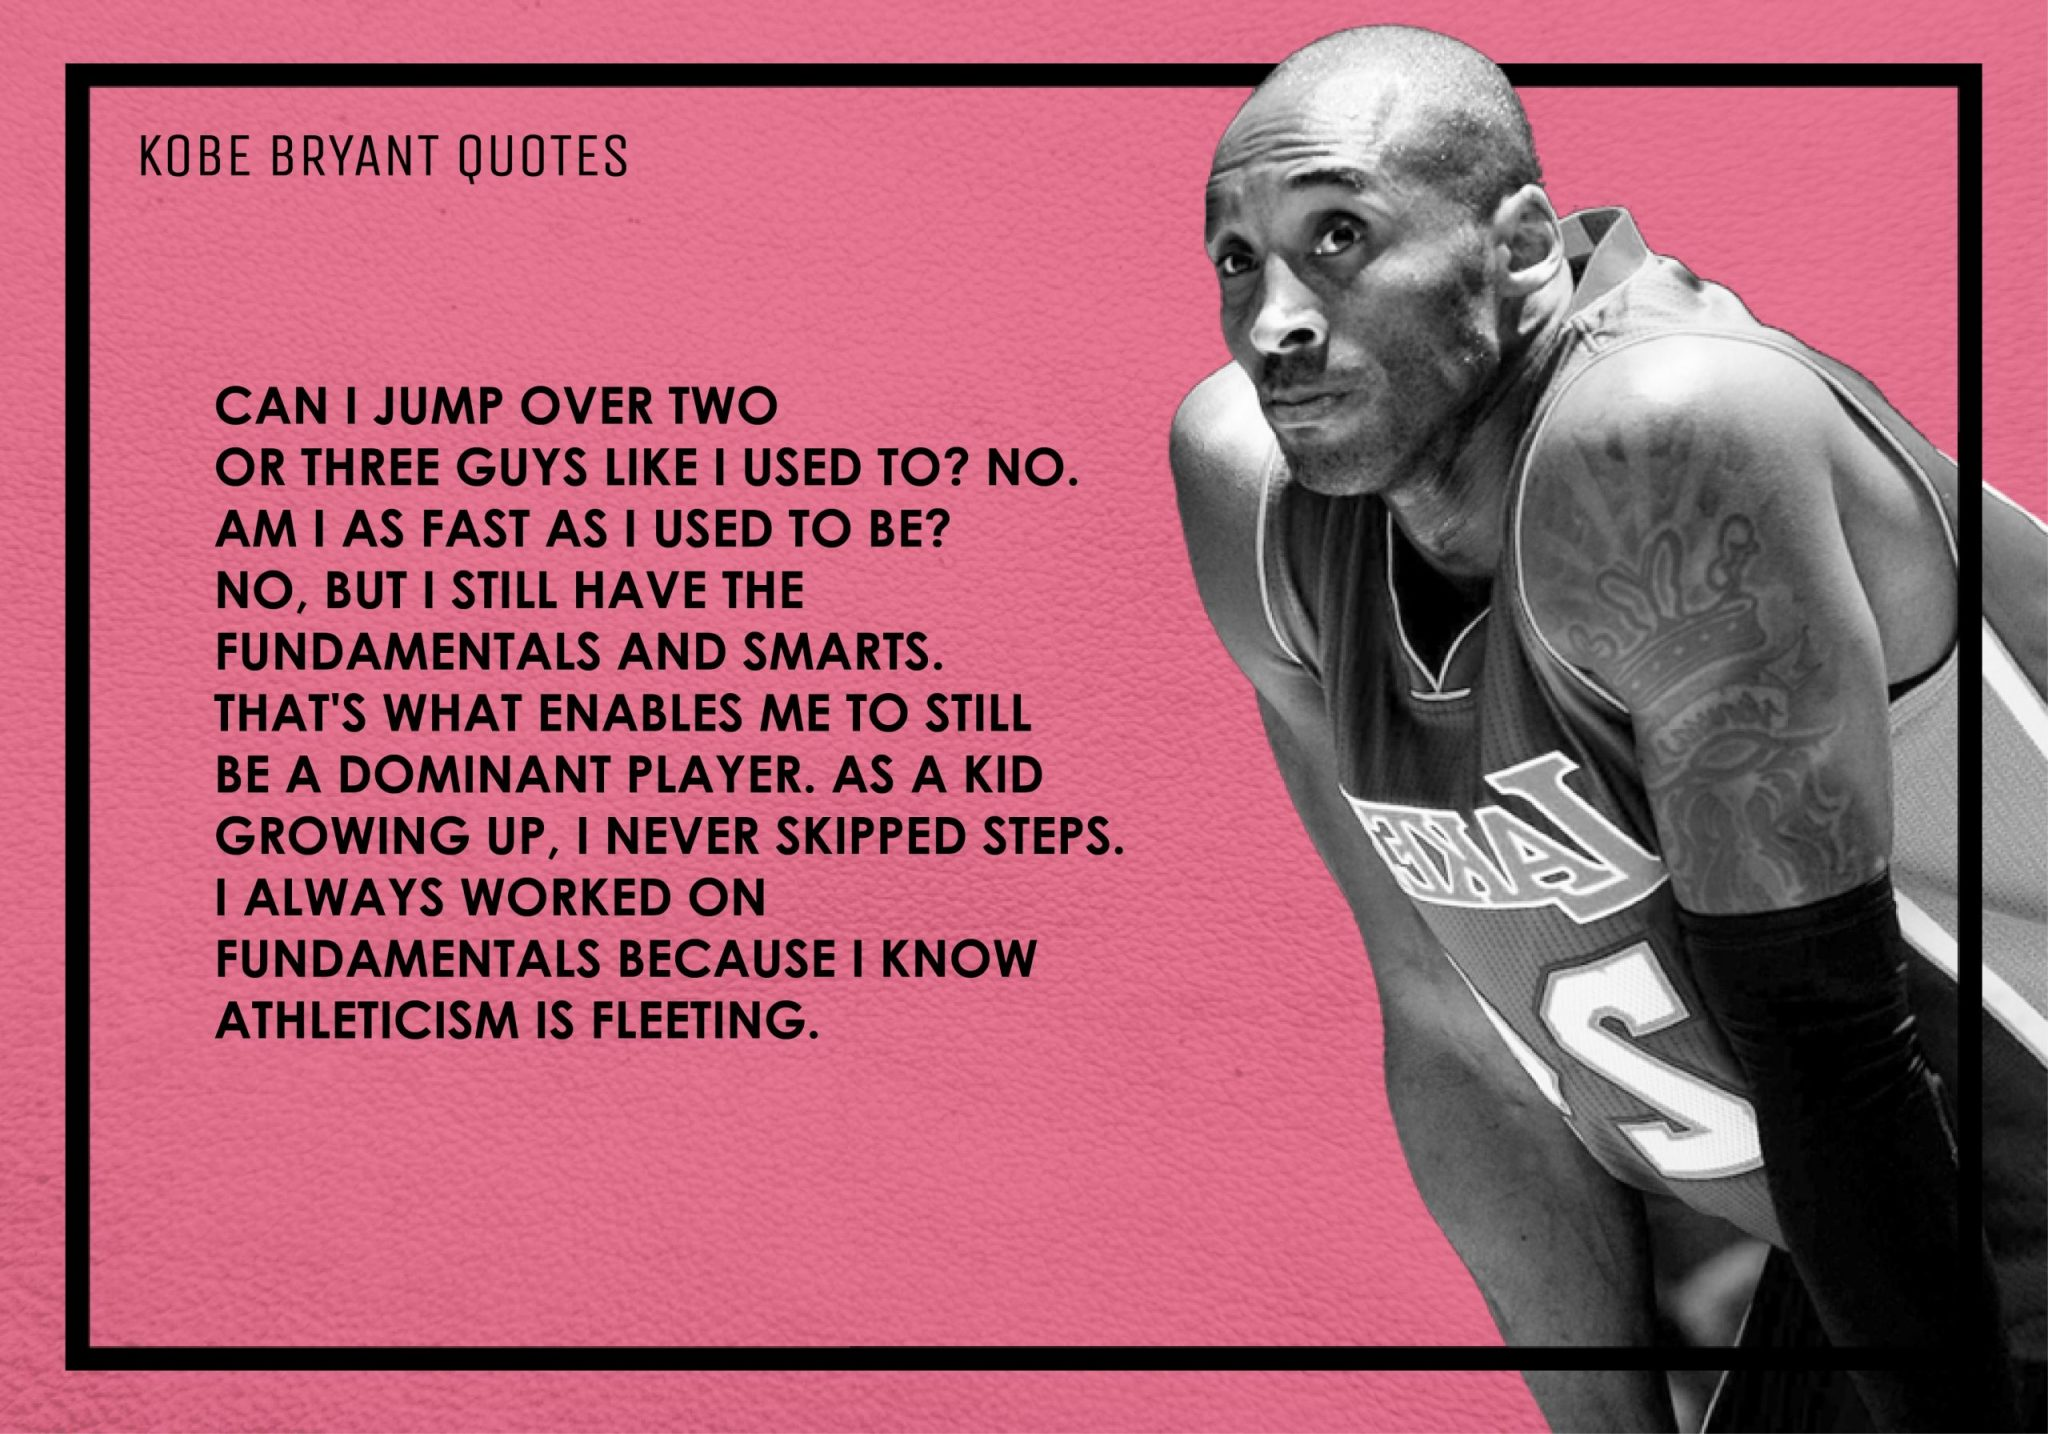 Kobe Bryant Quotes (9)